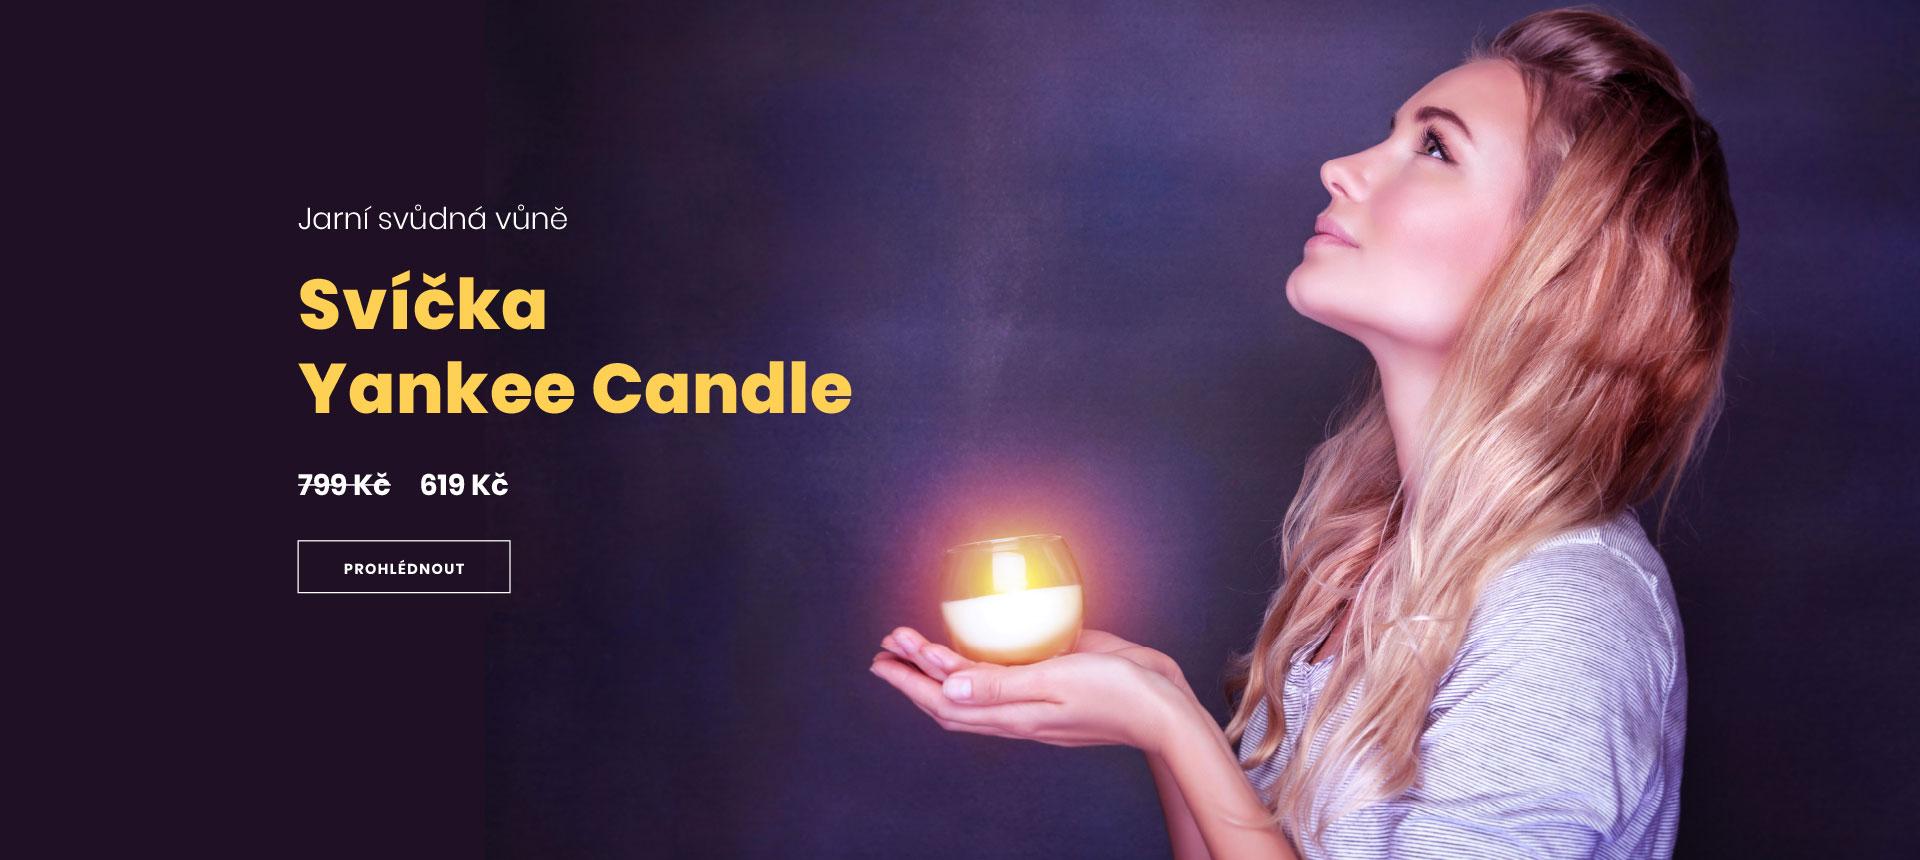 Svíčka Yankee Candle